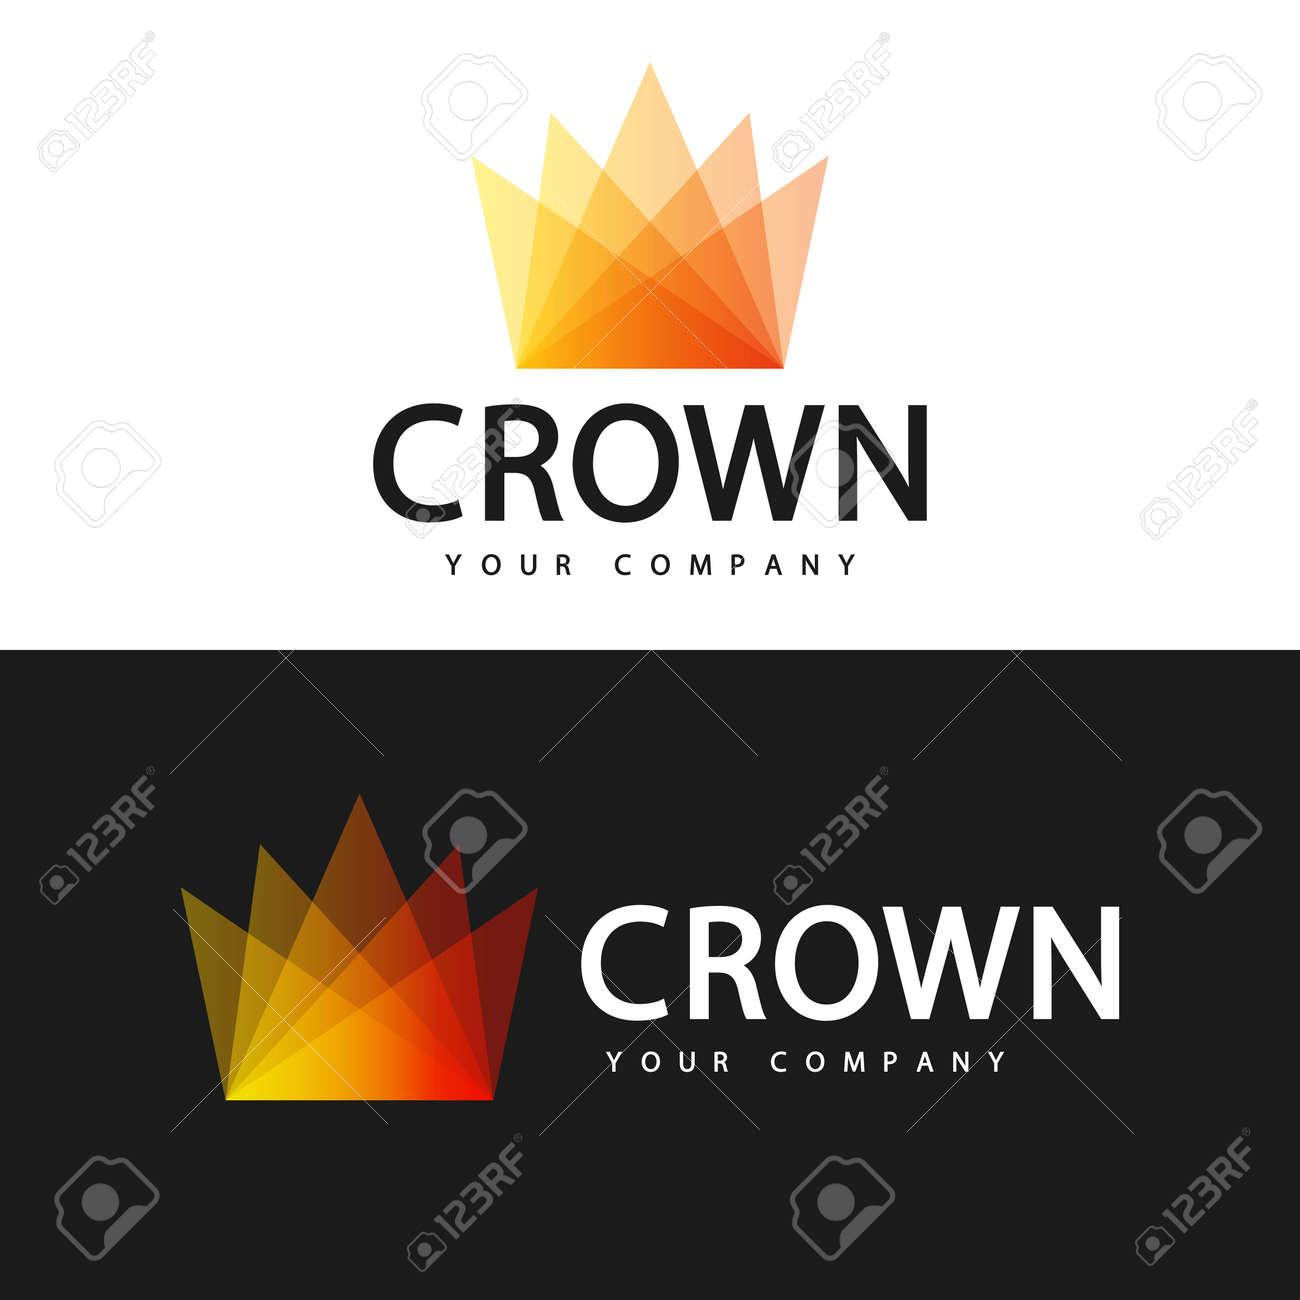 Logo template. Crown logo design. - 168190970